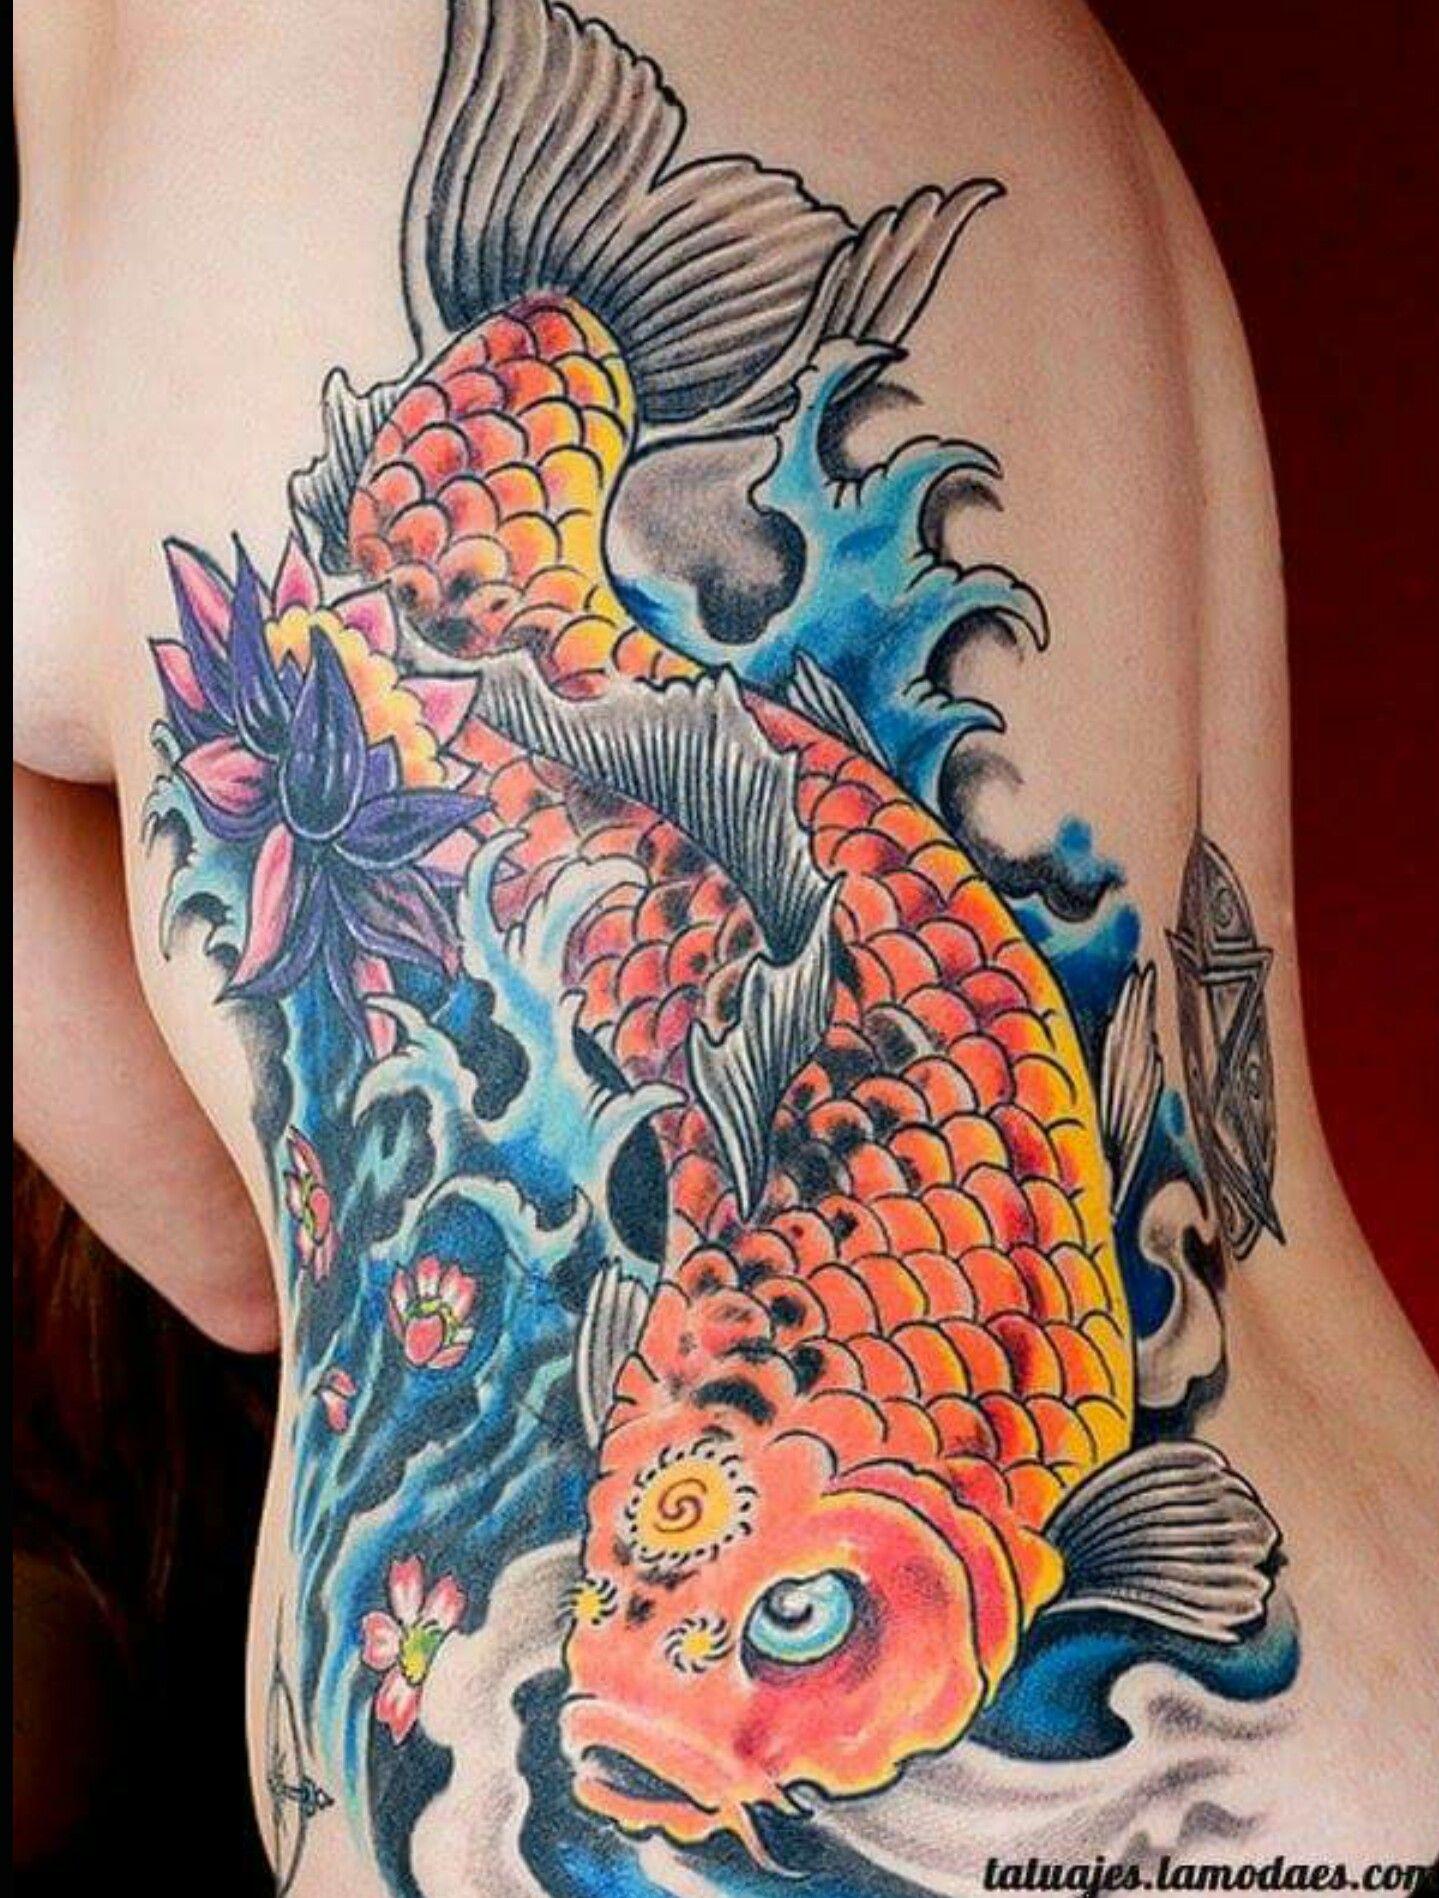 Pin By Lola Ruiz On Tattoos Japanese Koi Fish Tattoo Koi Tattoo Design Koi Fish Tattoo